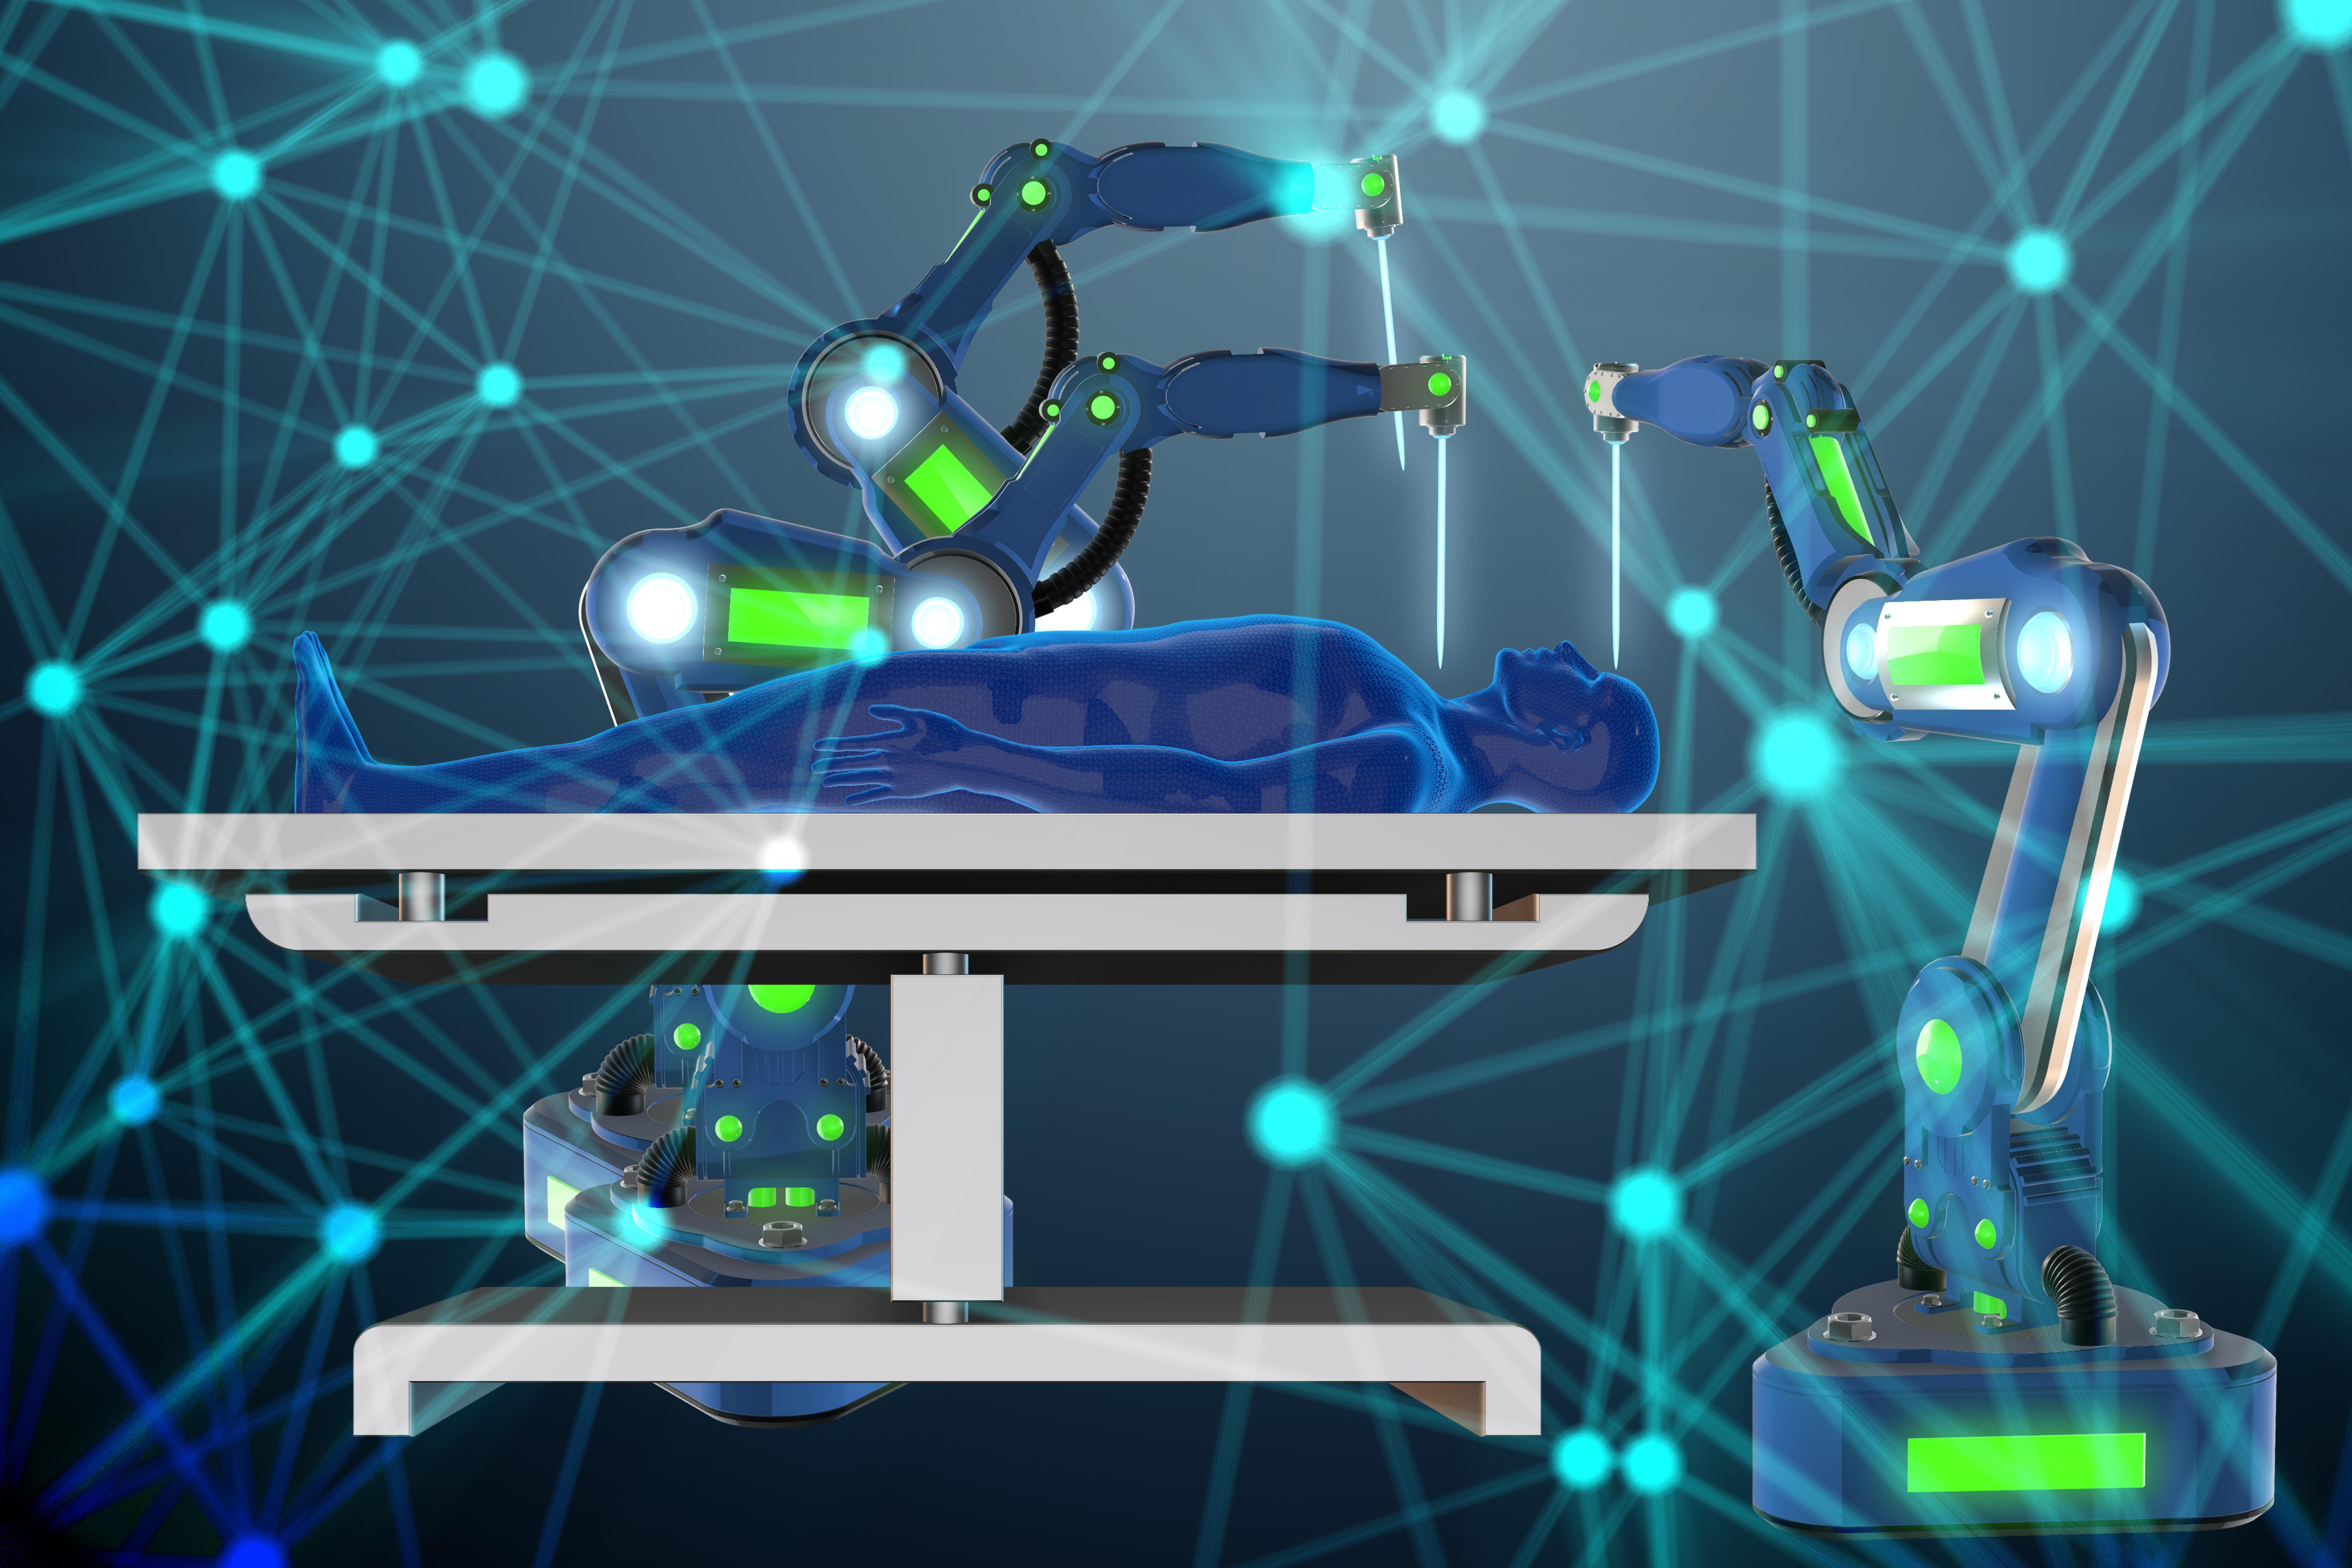 Mako The Robotic Surgeon Revolutionizing Knee Replacements